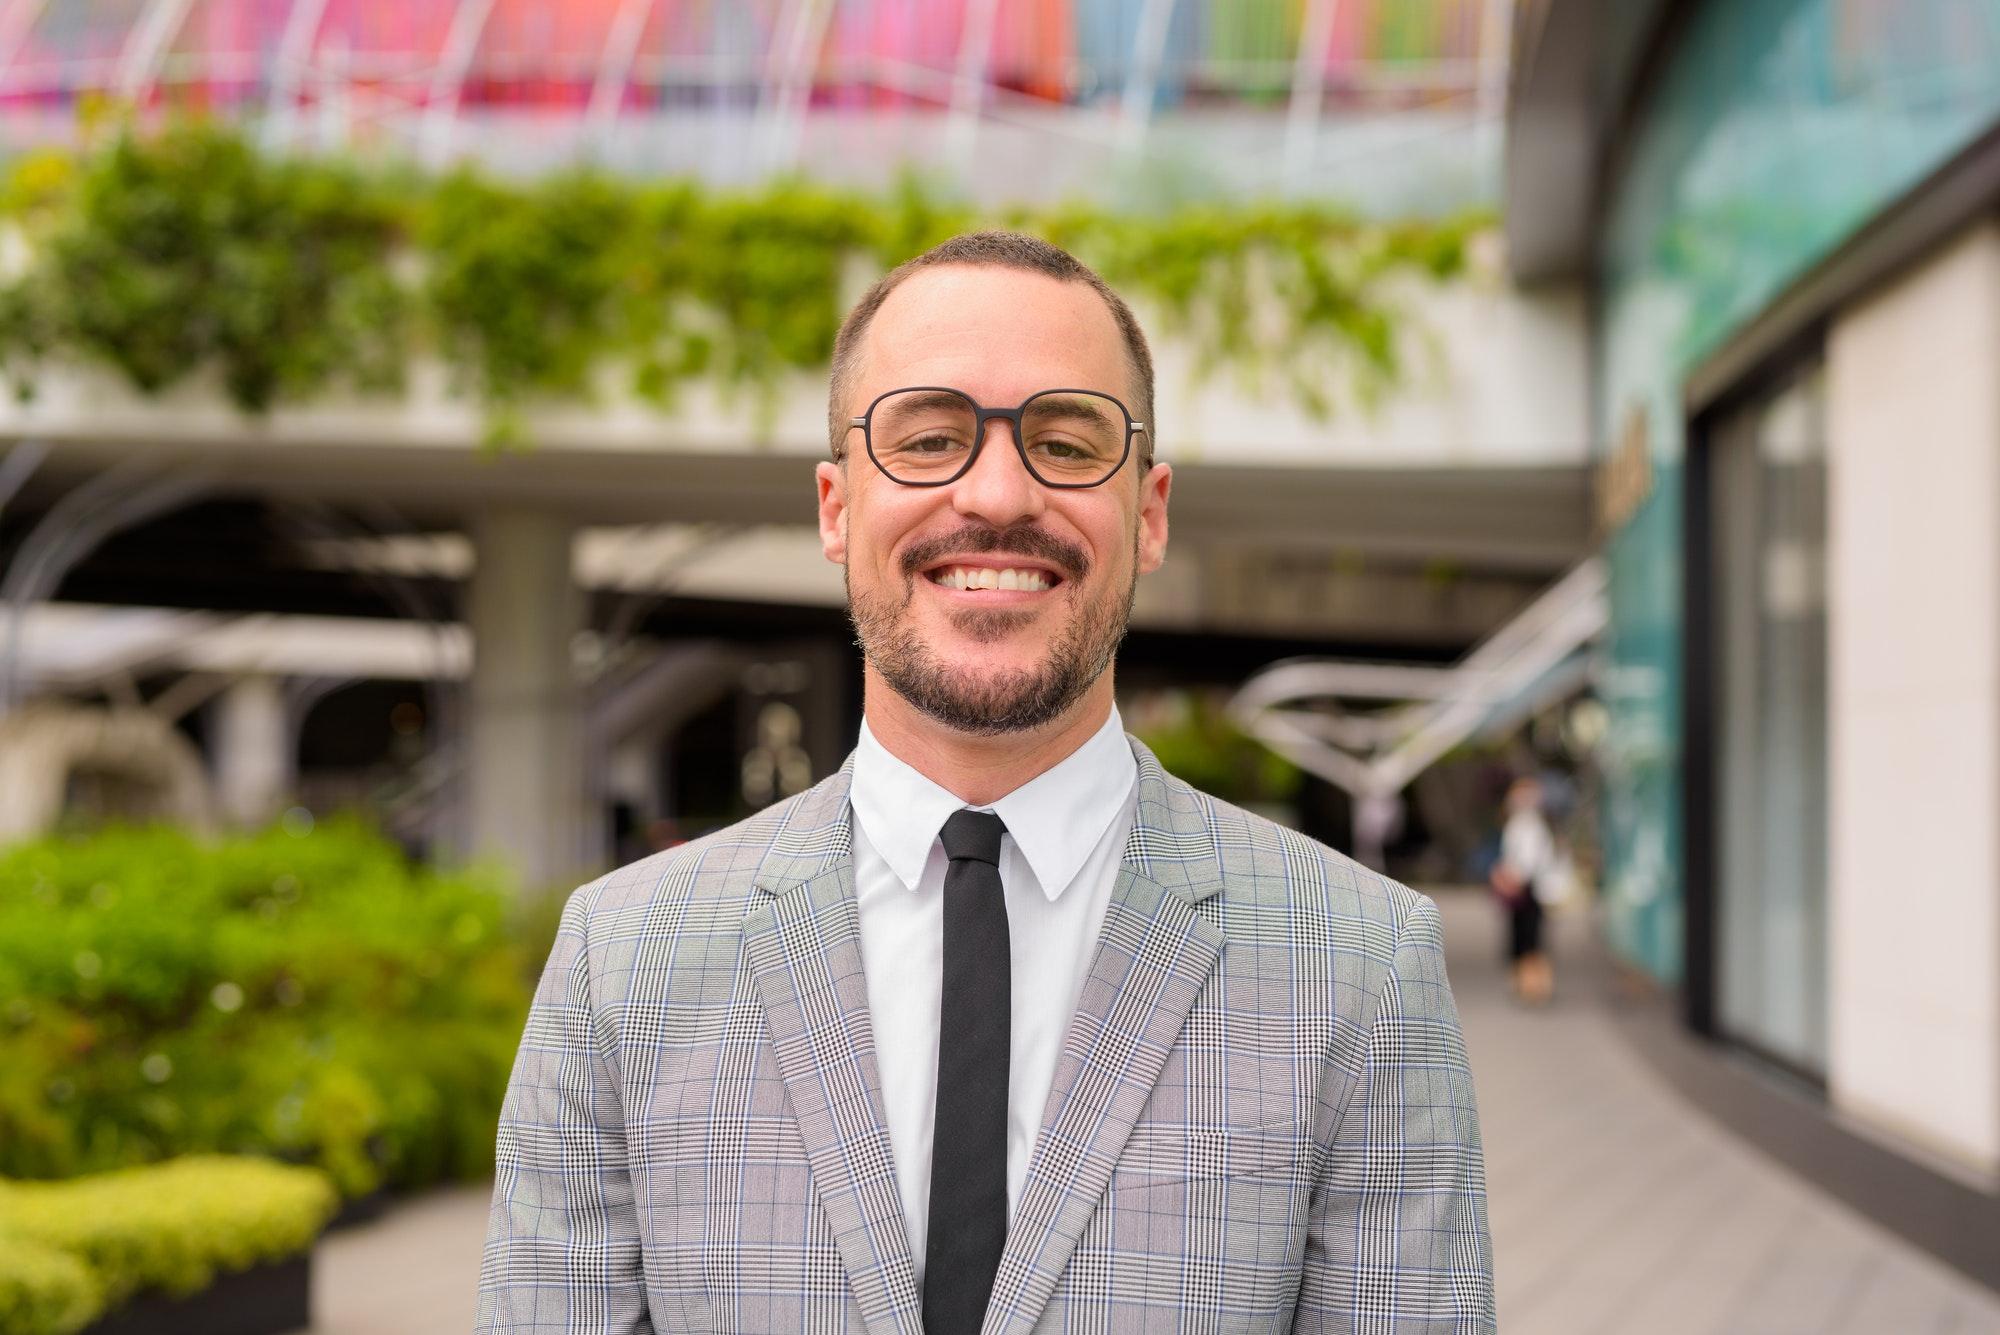 Happy Hispanic bald bearded businessman with eyeglasses smiling outside modern building